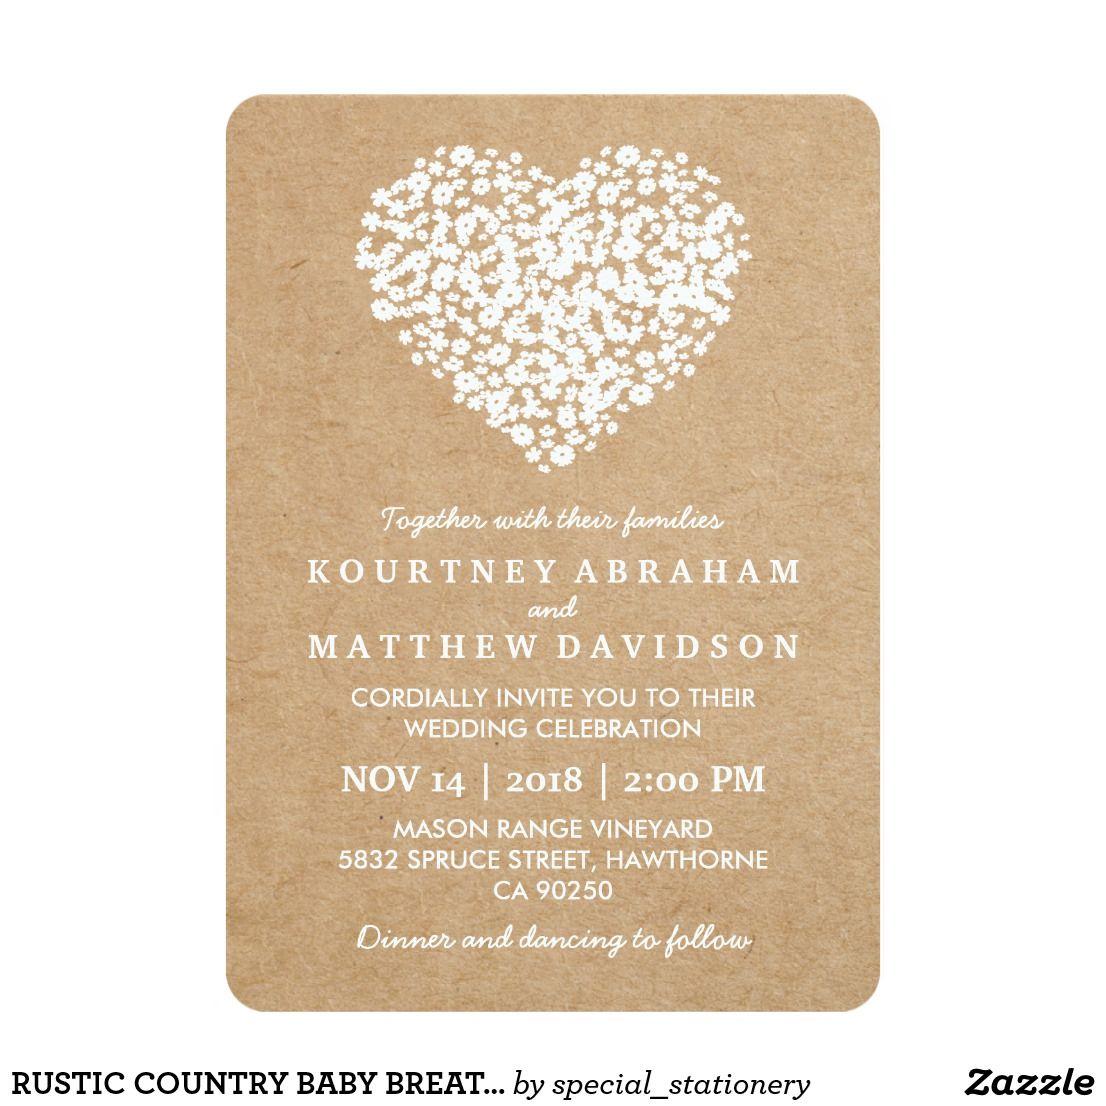 Rustic Country Baby Breath Flowers Wedding Invitation Zazzle Com Wedding Invitations Rustic Country Wedding Invitations Rustic Flower Wedding Invitation